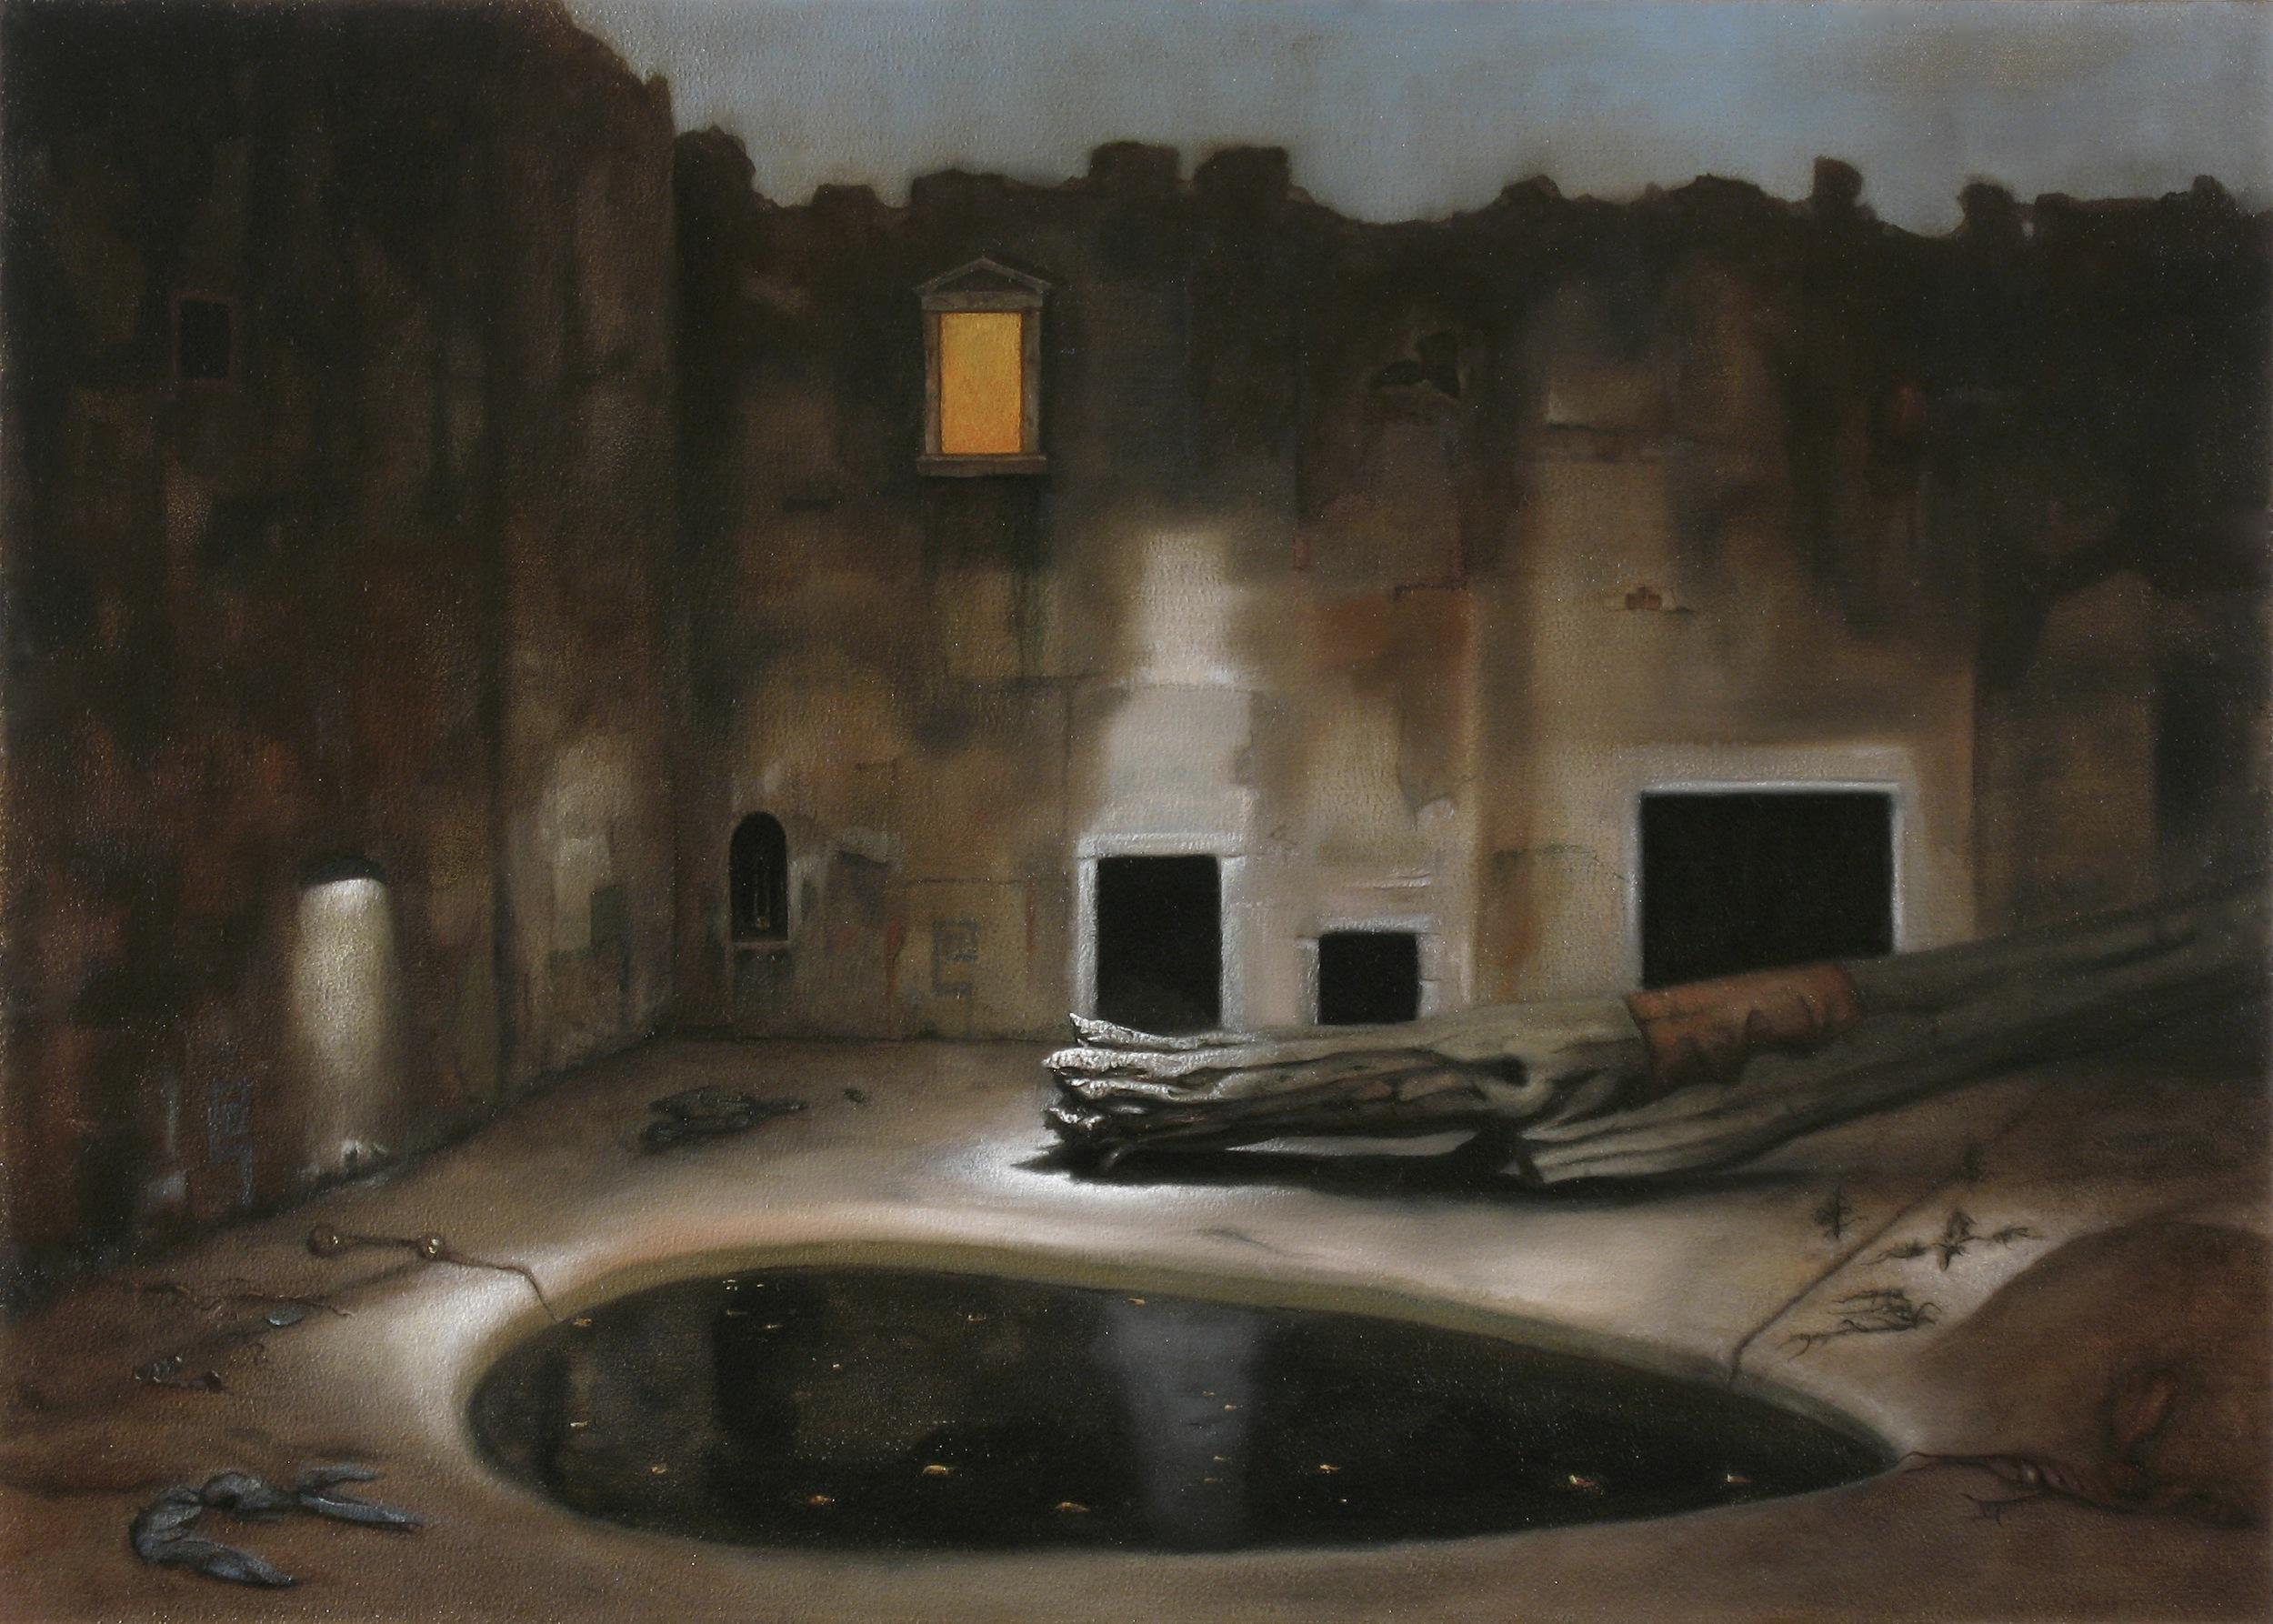 Dwelling, Oil on wood panel, 50 x 70cm, 2011